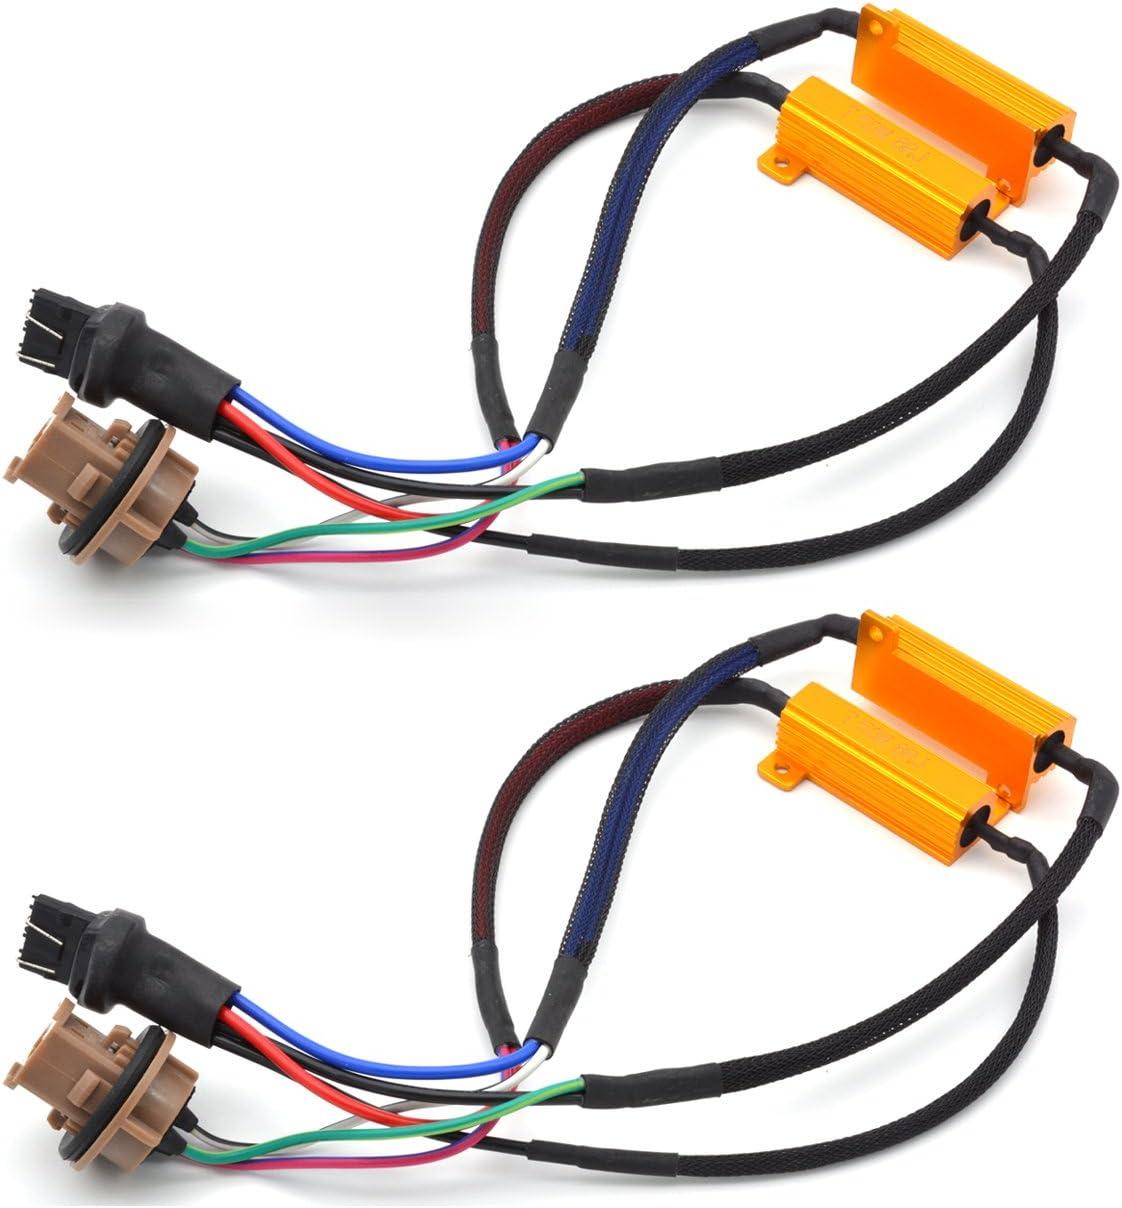 KATUR quality assurance 2pcs 50W 8ohm 7443 7444NA Led Fix Resistors Load LED Elegant - Bul